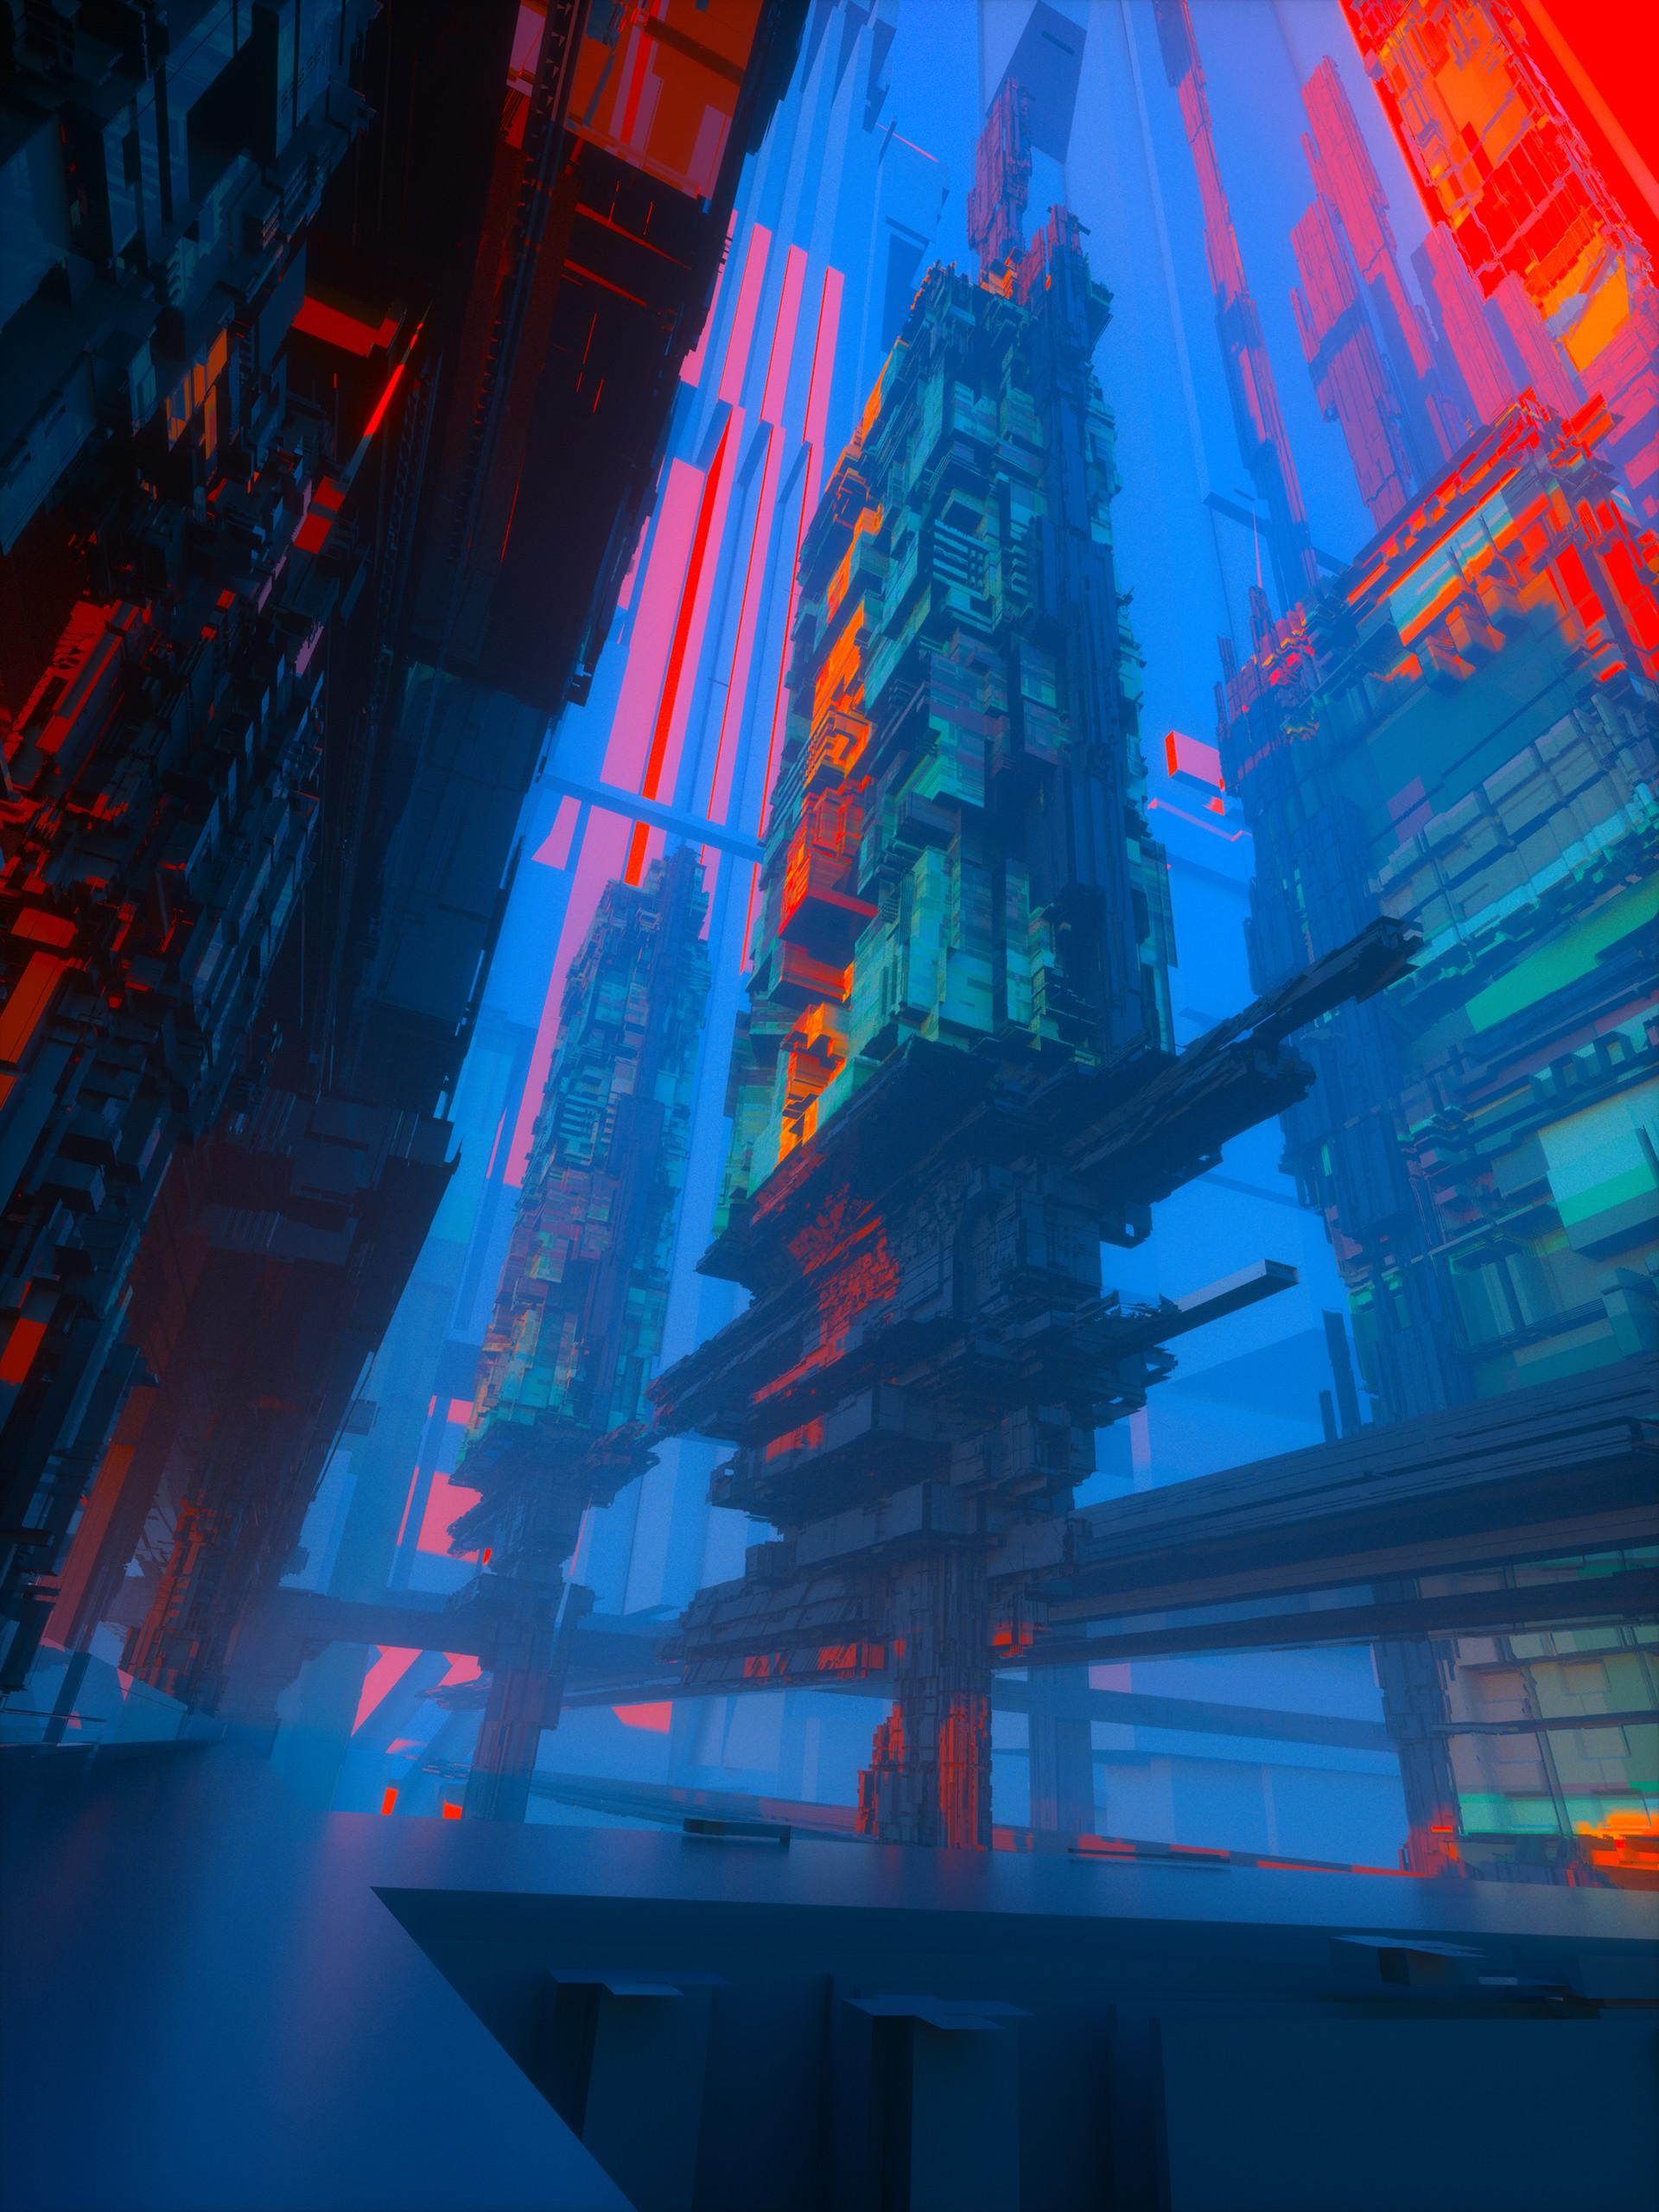 Leon tukker city colorful00013d